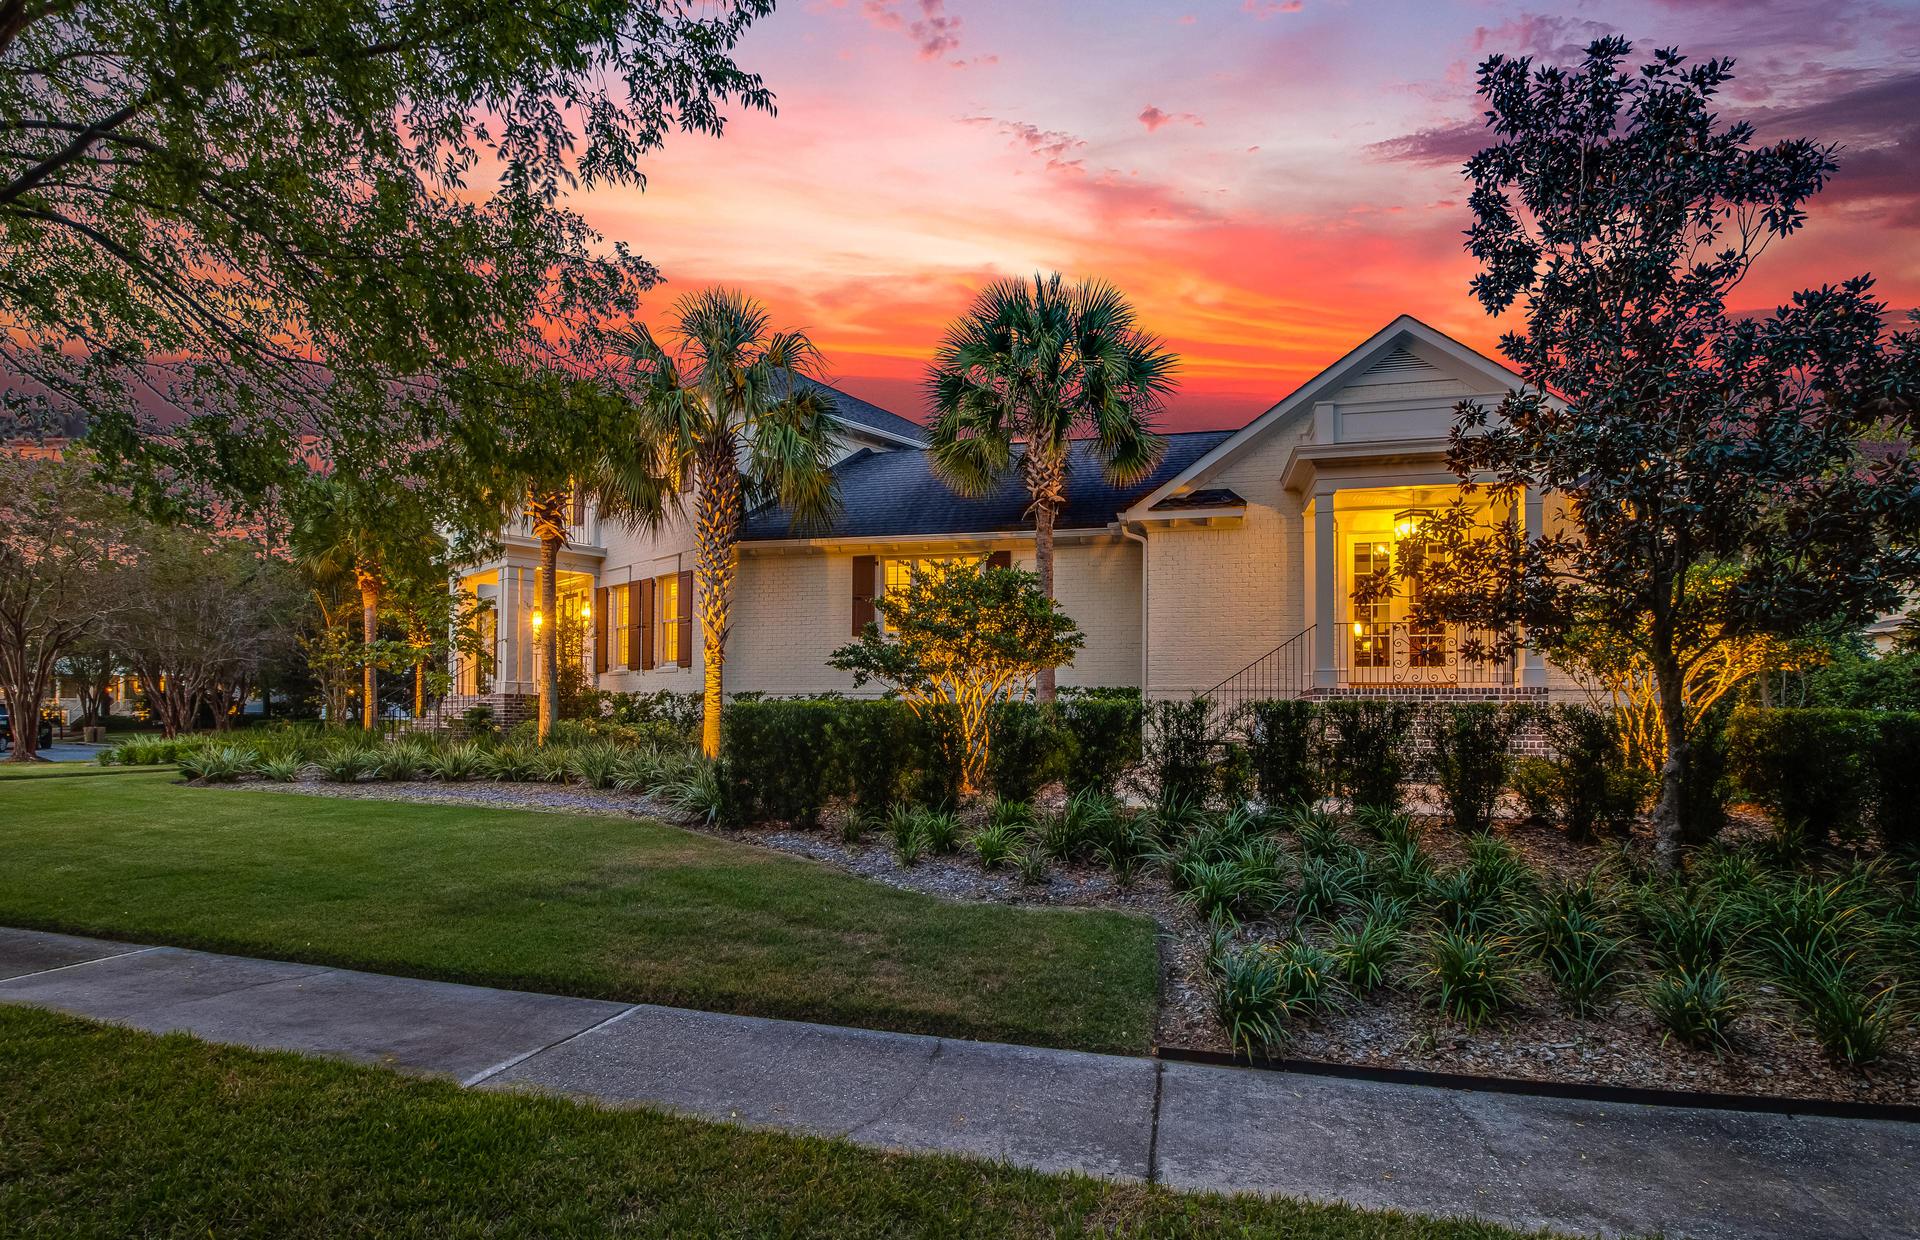 Olde Park Homes For Sale - 770 Olde Central, Mount Pleasant, SC - 63